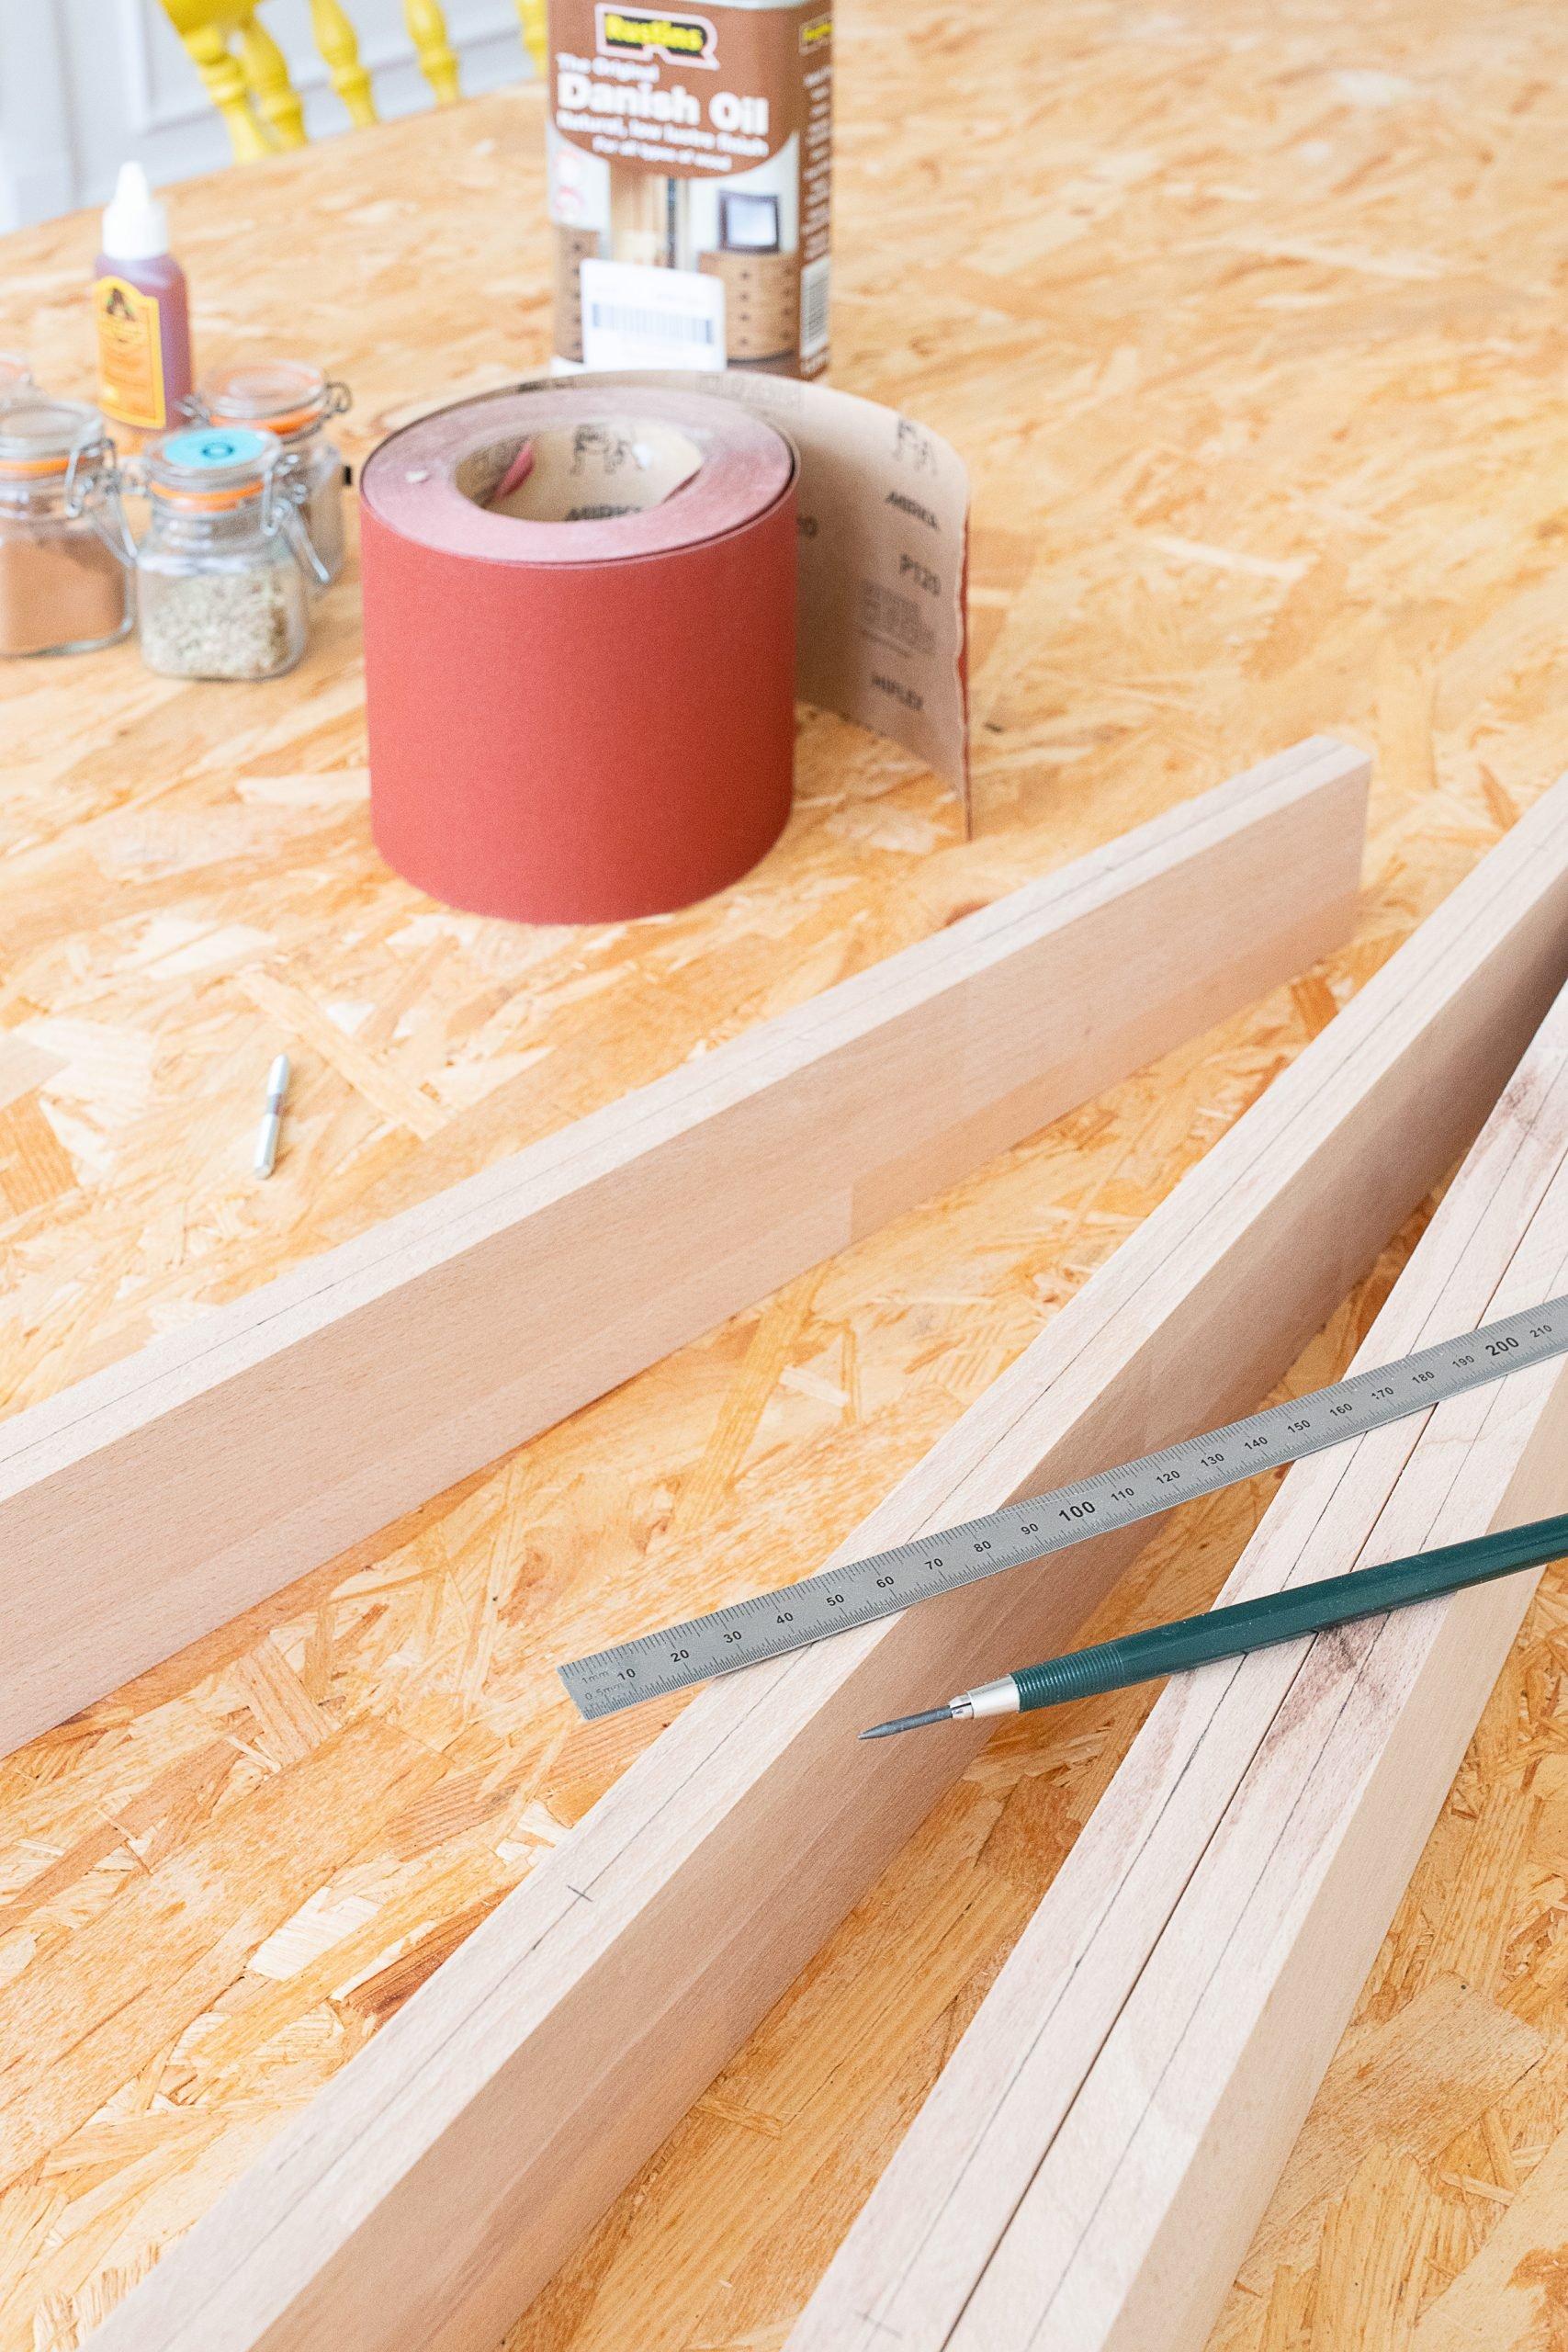 DIY Floating Spice Shelves - Drill | Little House On The Corner